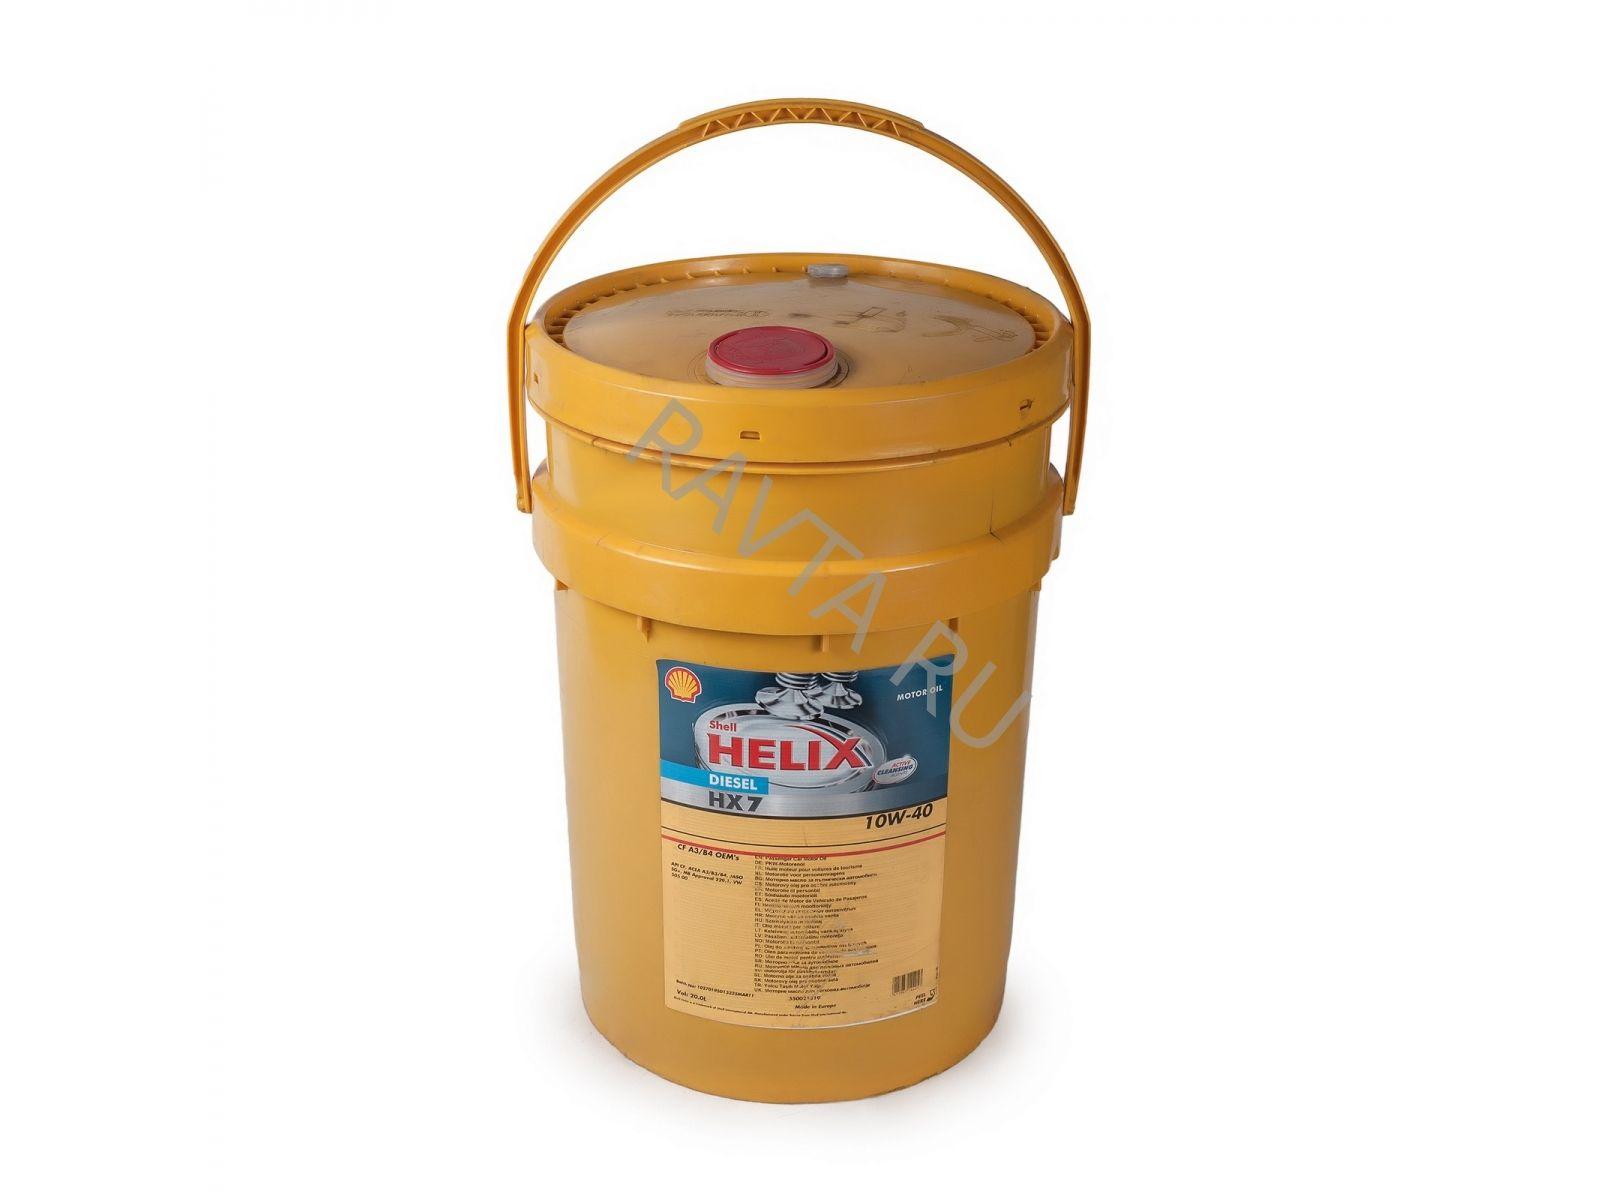 Масло Shell Helix Diesel HX7 10W-40 (20л) от Ravta